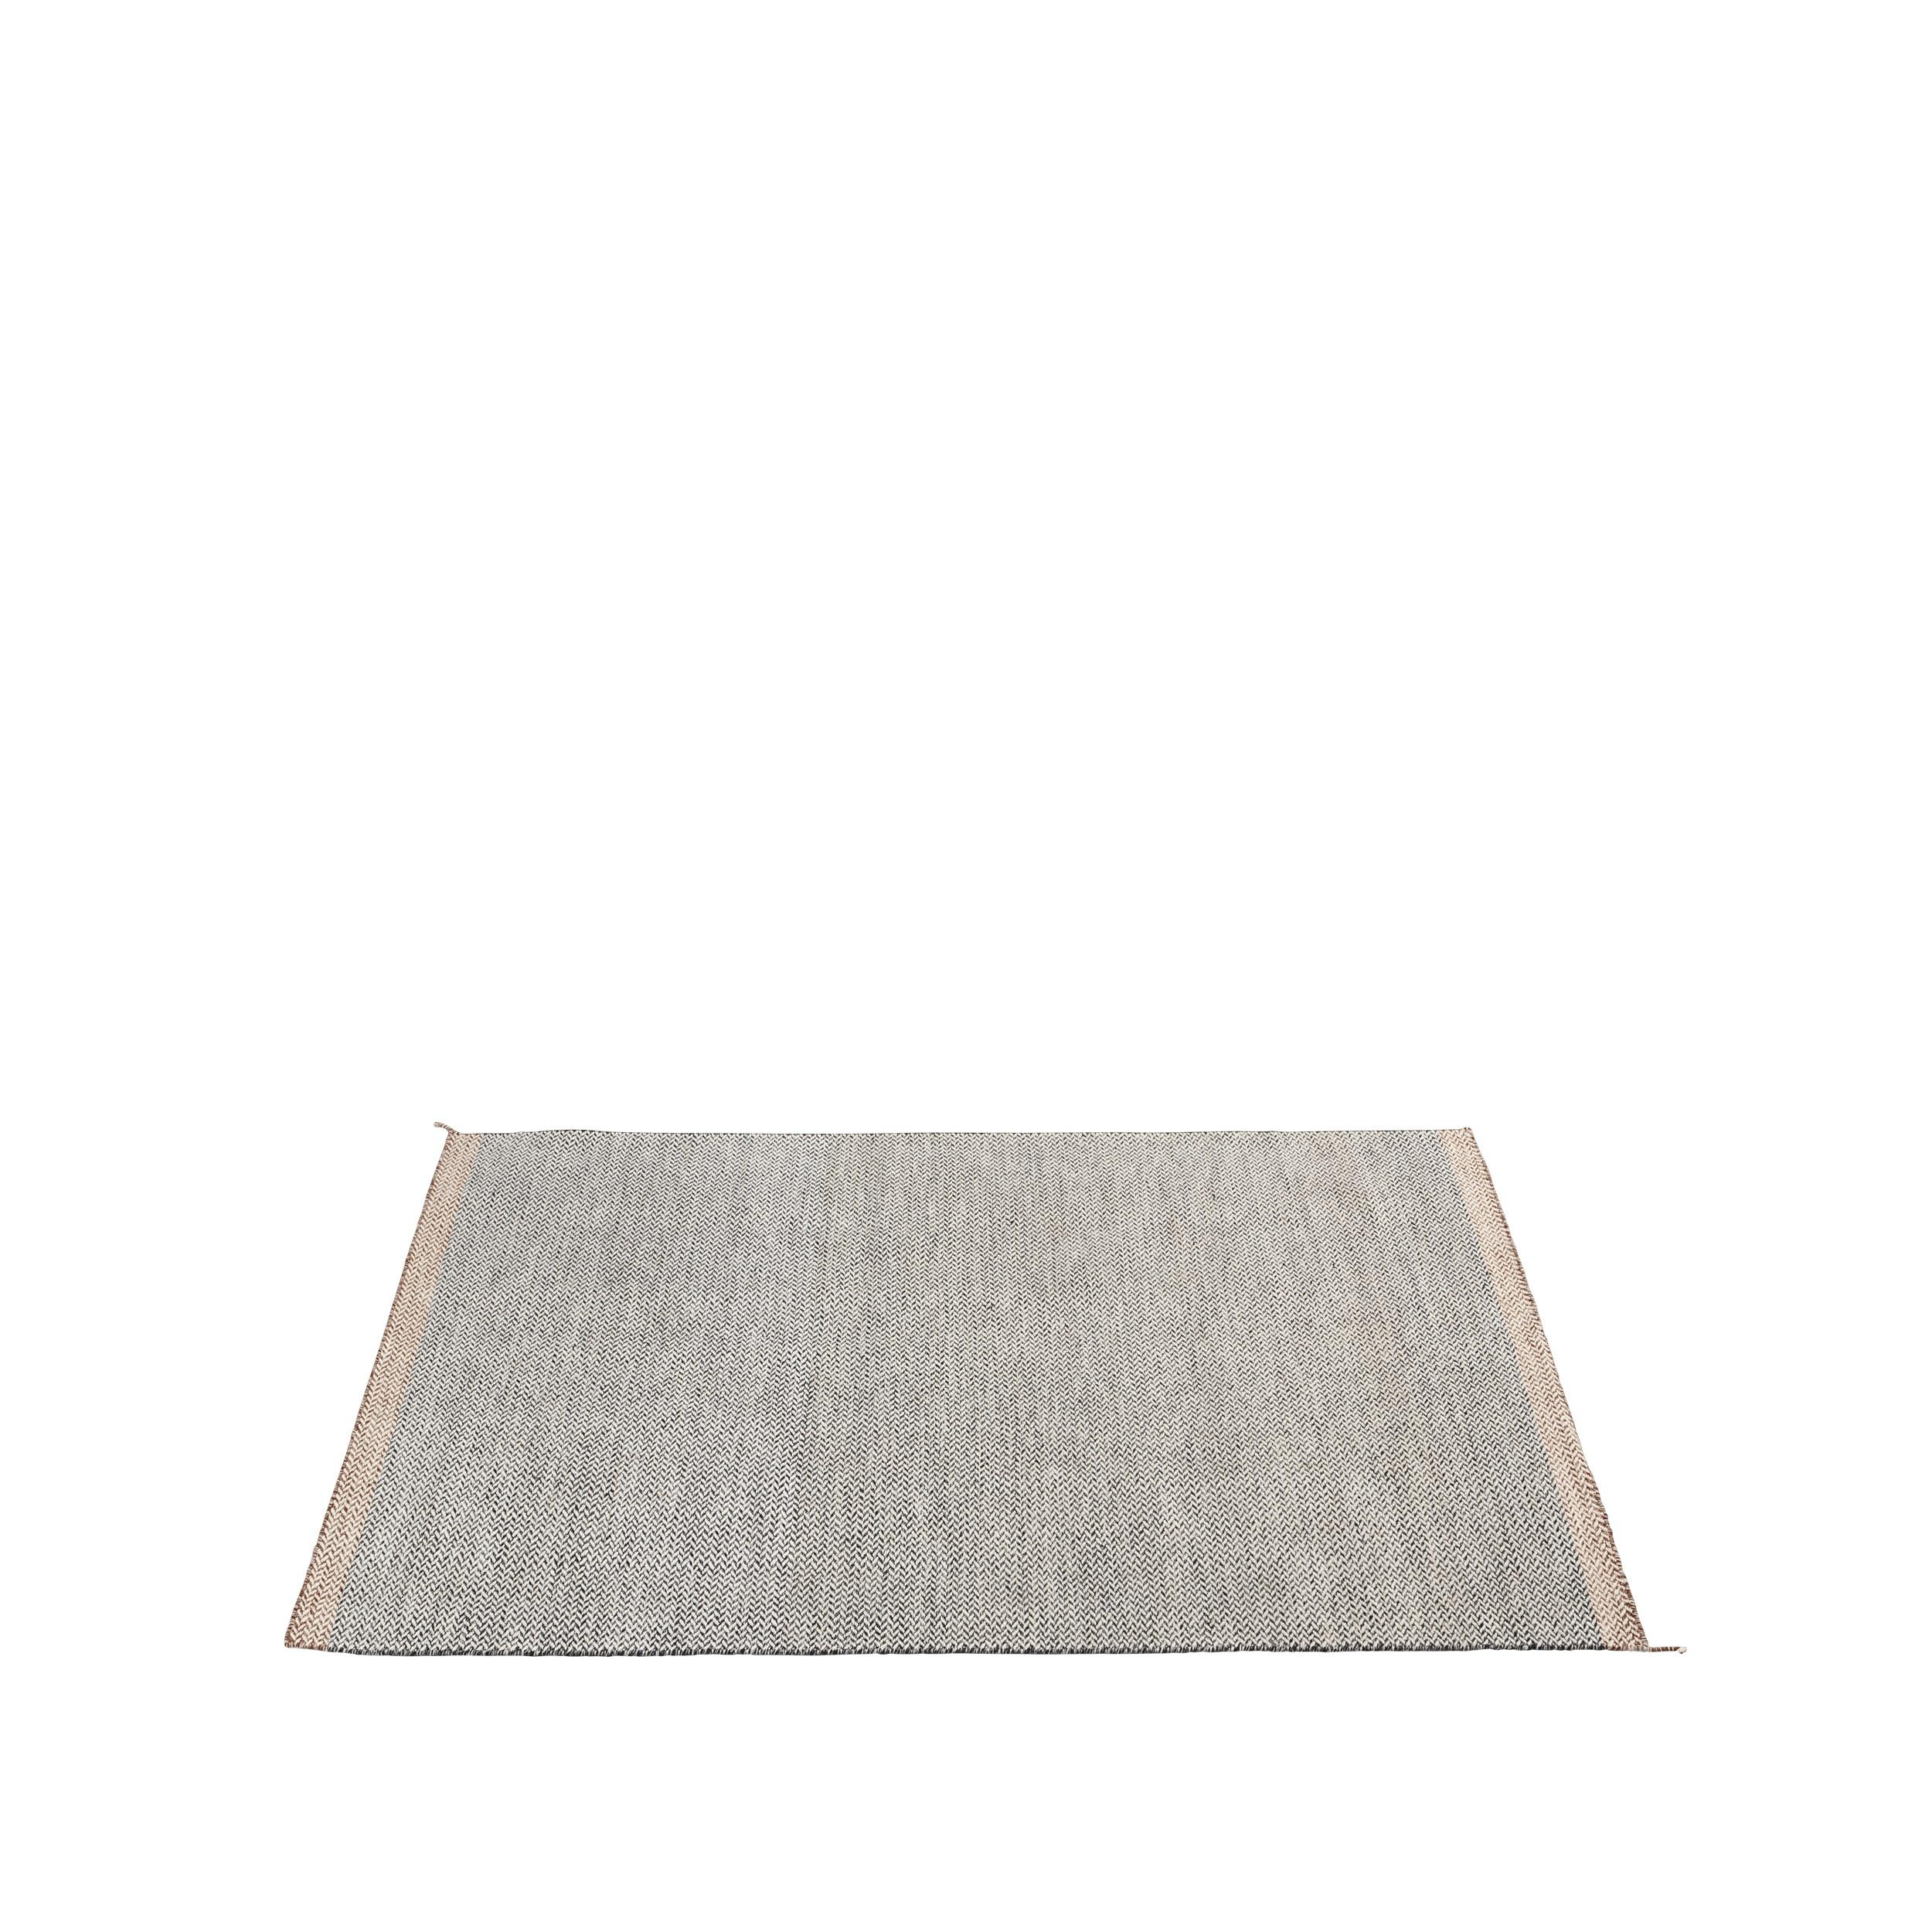 Ply rug 170 x 240 black/white